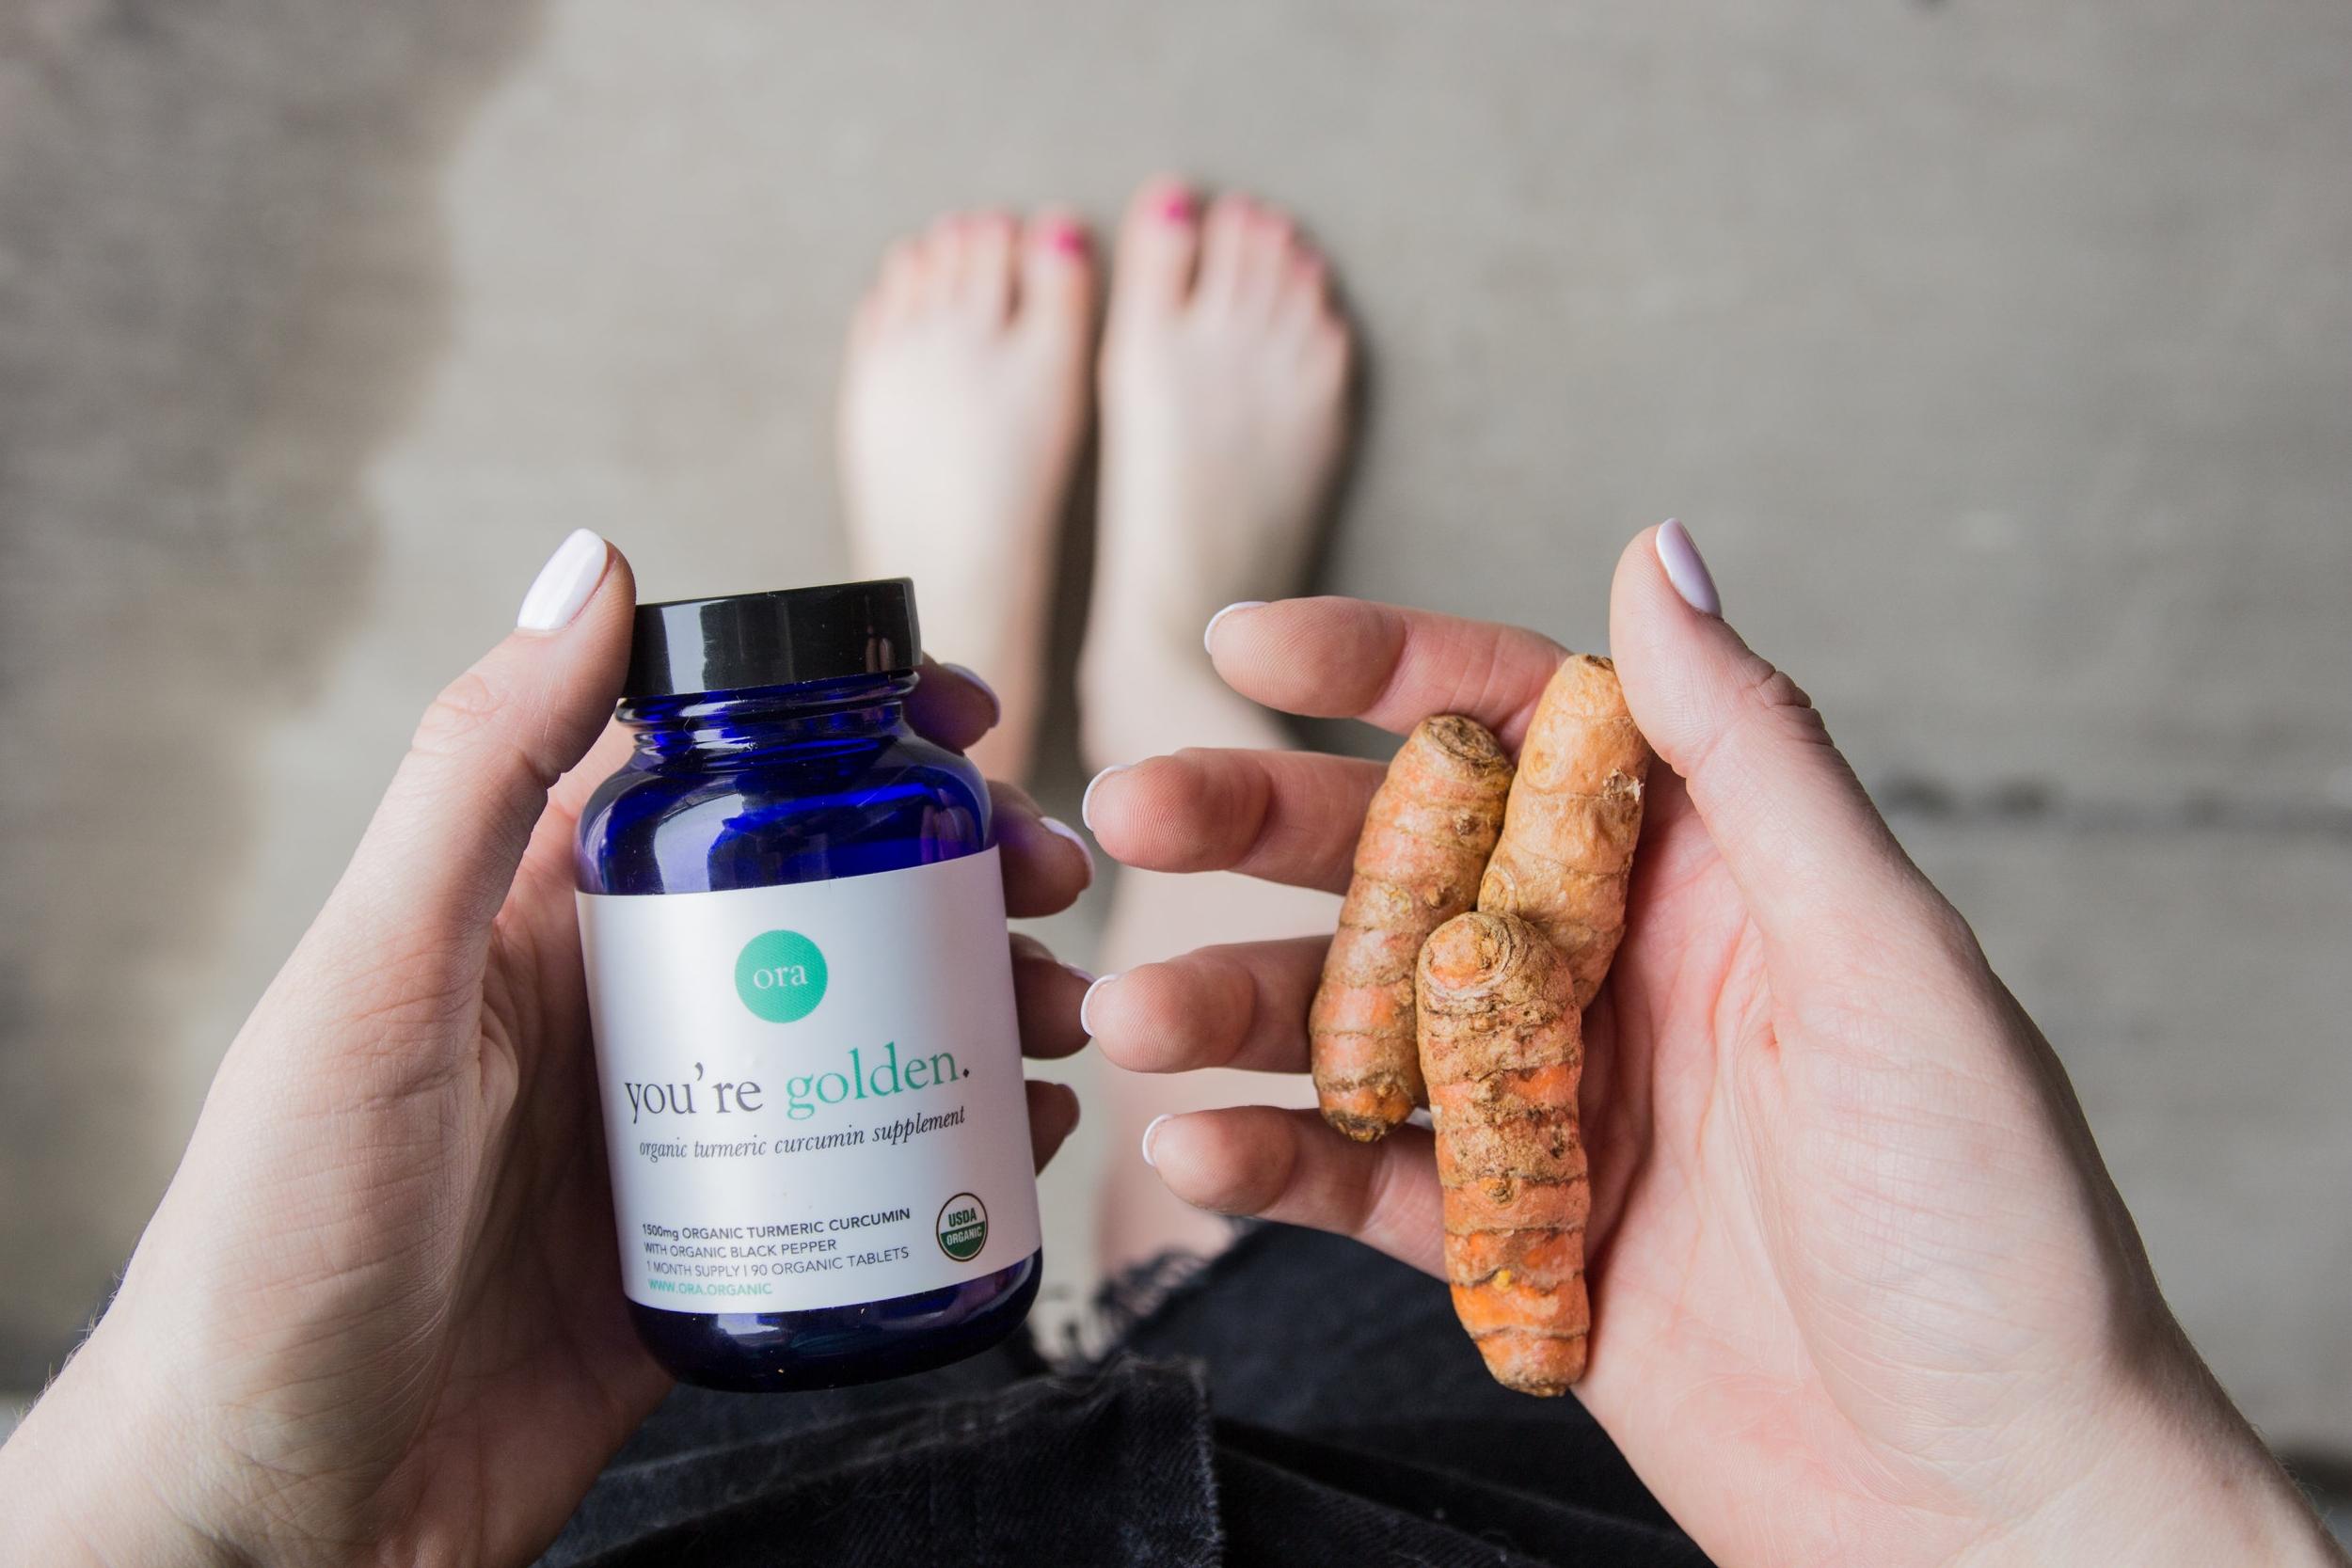 why i started taking a turmeric supplement, ora organics organic turmeric curcumin, benefits of turmeric, how does turmeric help your body,  natural remedies for arthritis, vegetarian turmeric supplements